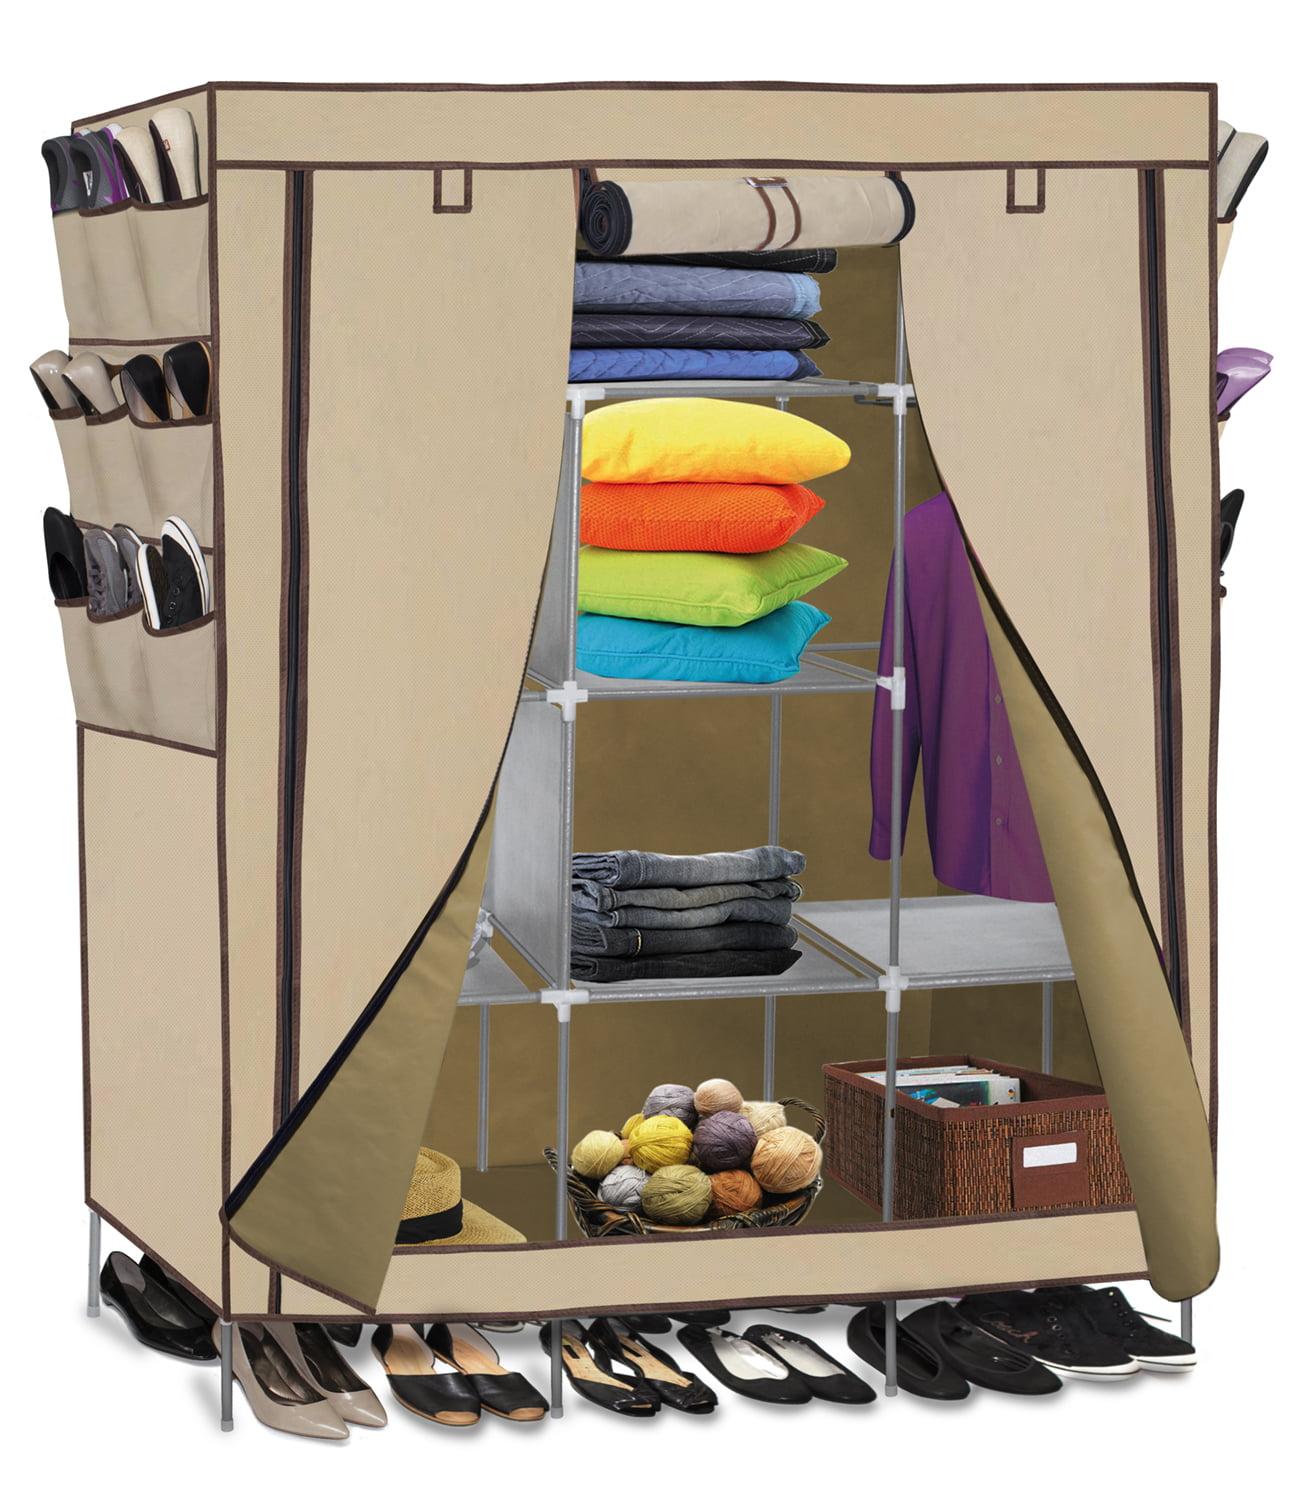 oxgord portable storage organizer wardrobe closet u0026 shoe rack shelves stainless steel frame